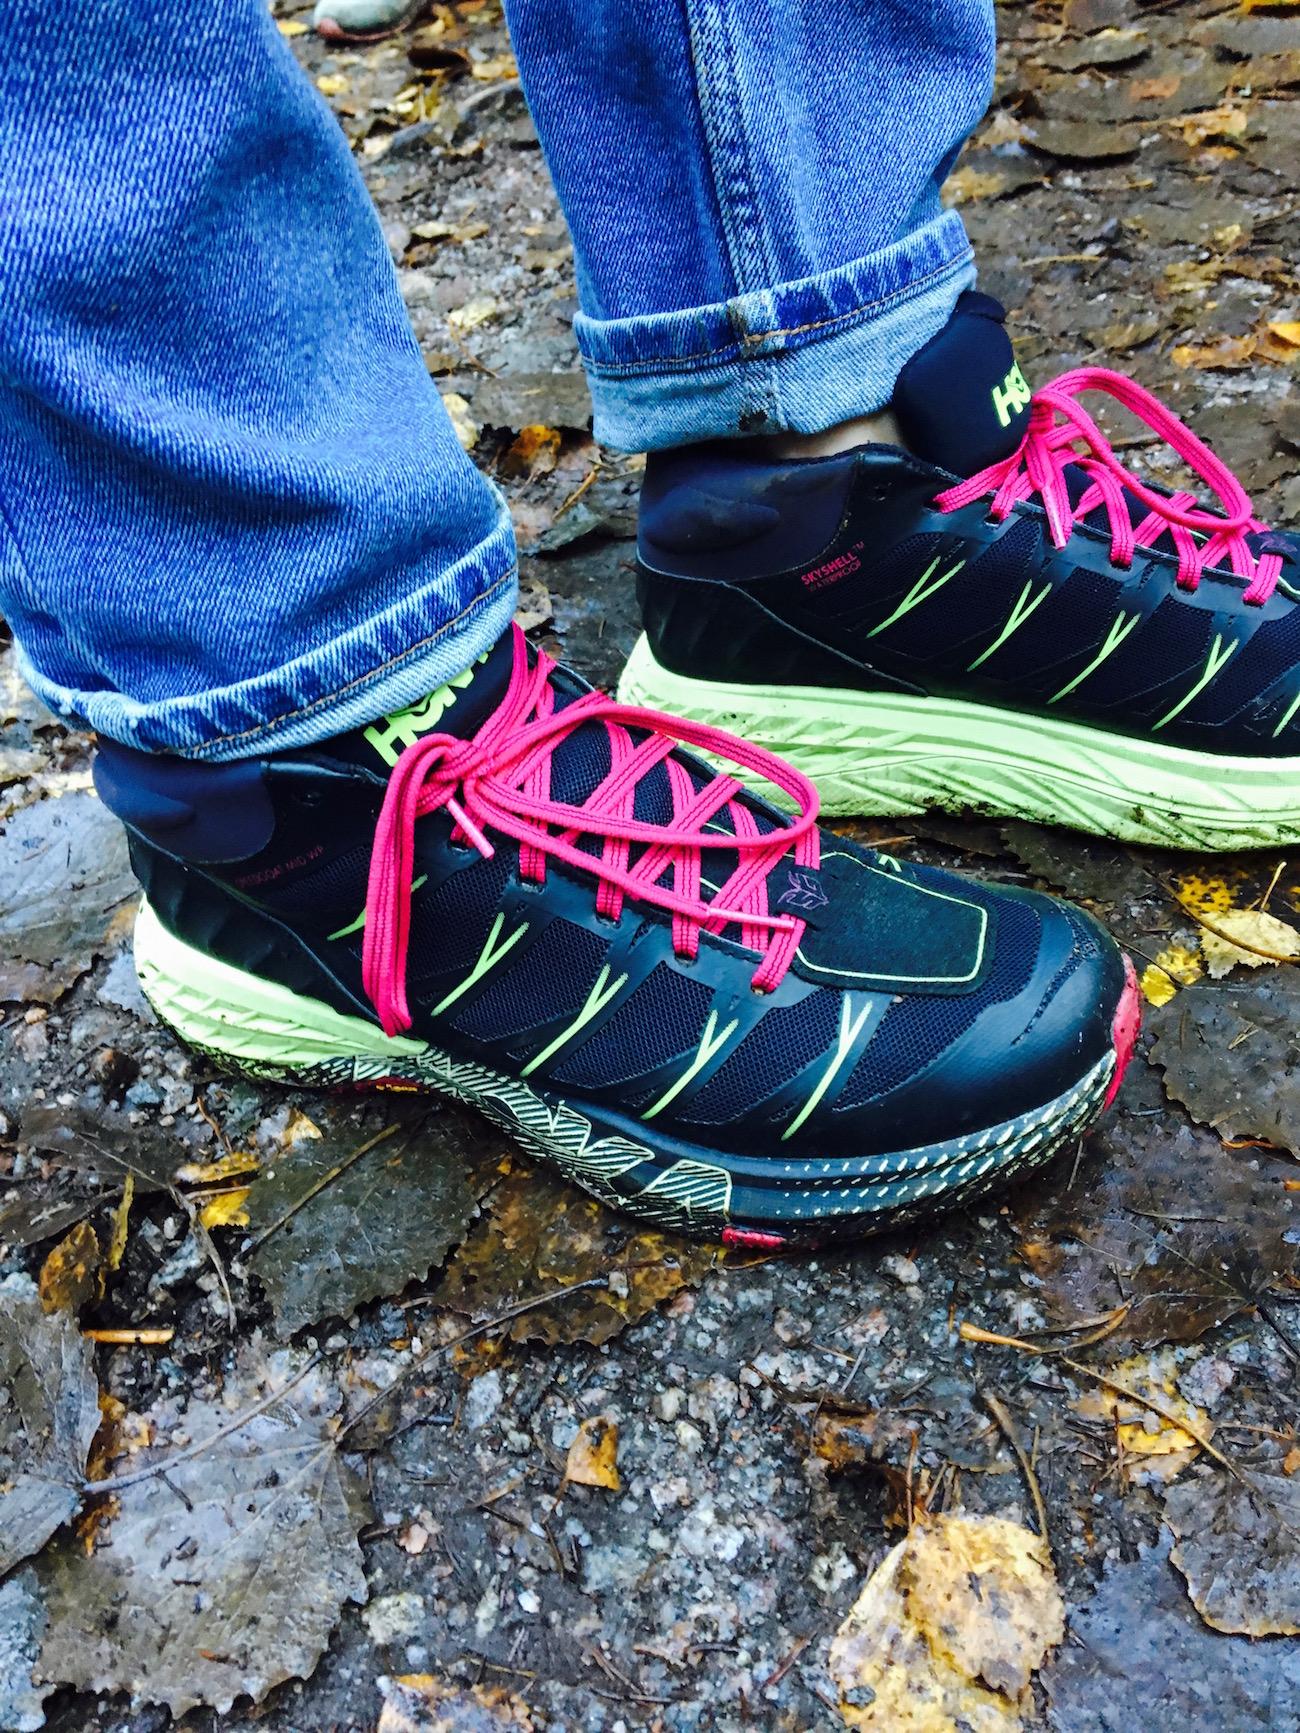 Kävely ja ulkoilu – uudet trendilajit!